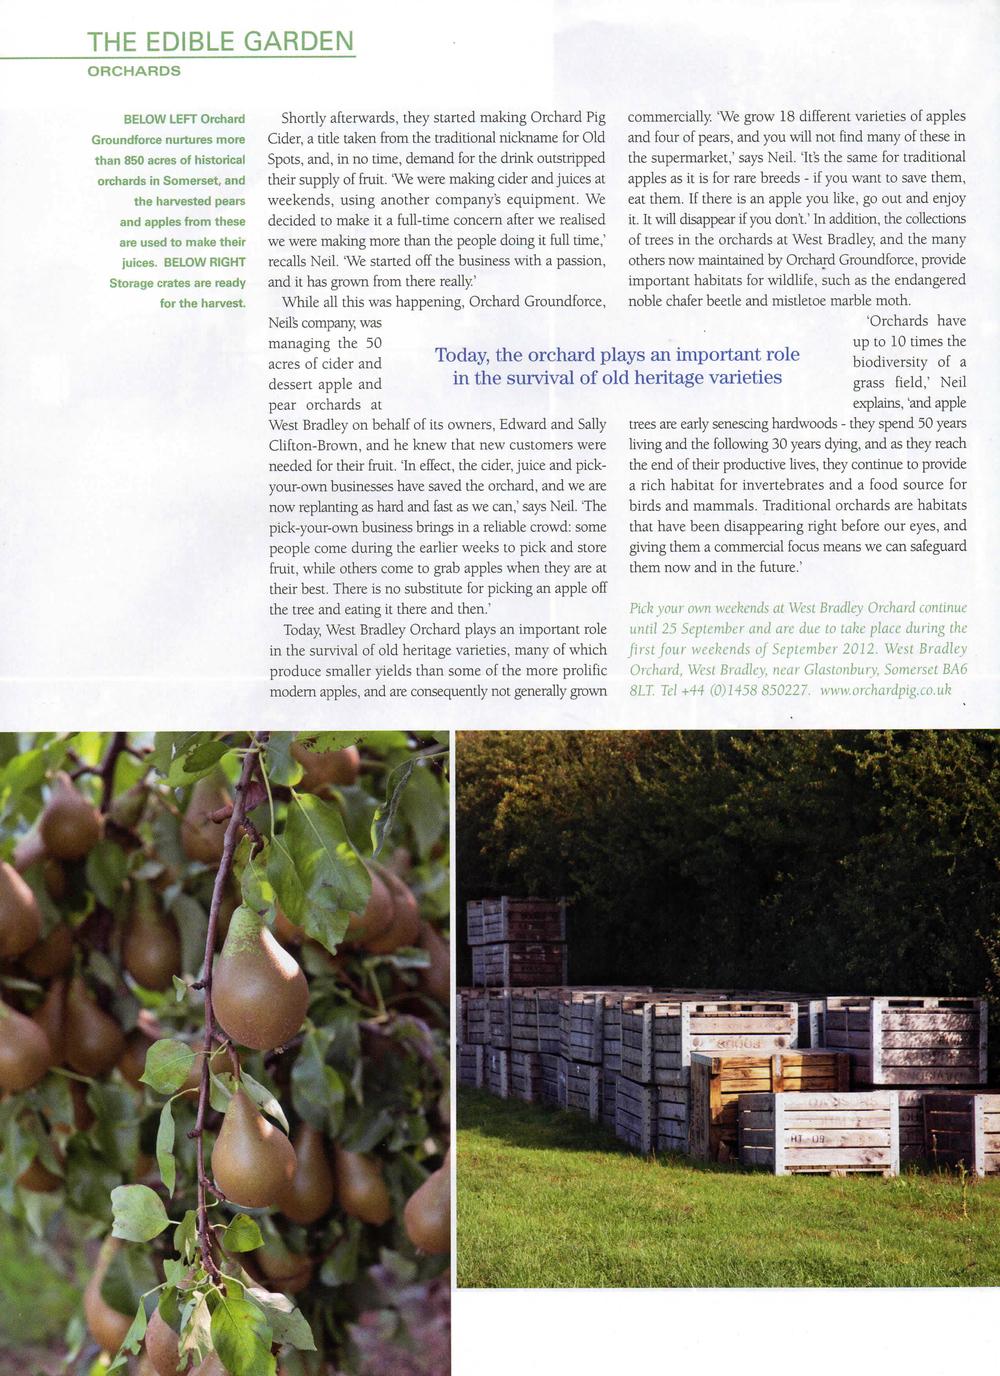 West Bradley Orchard EG001-3.jpg